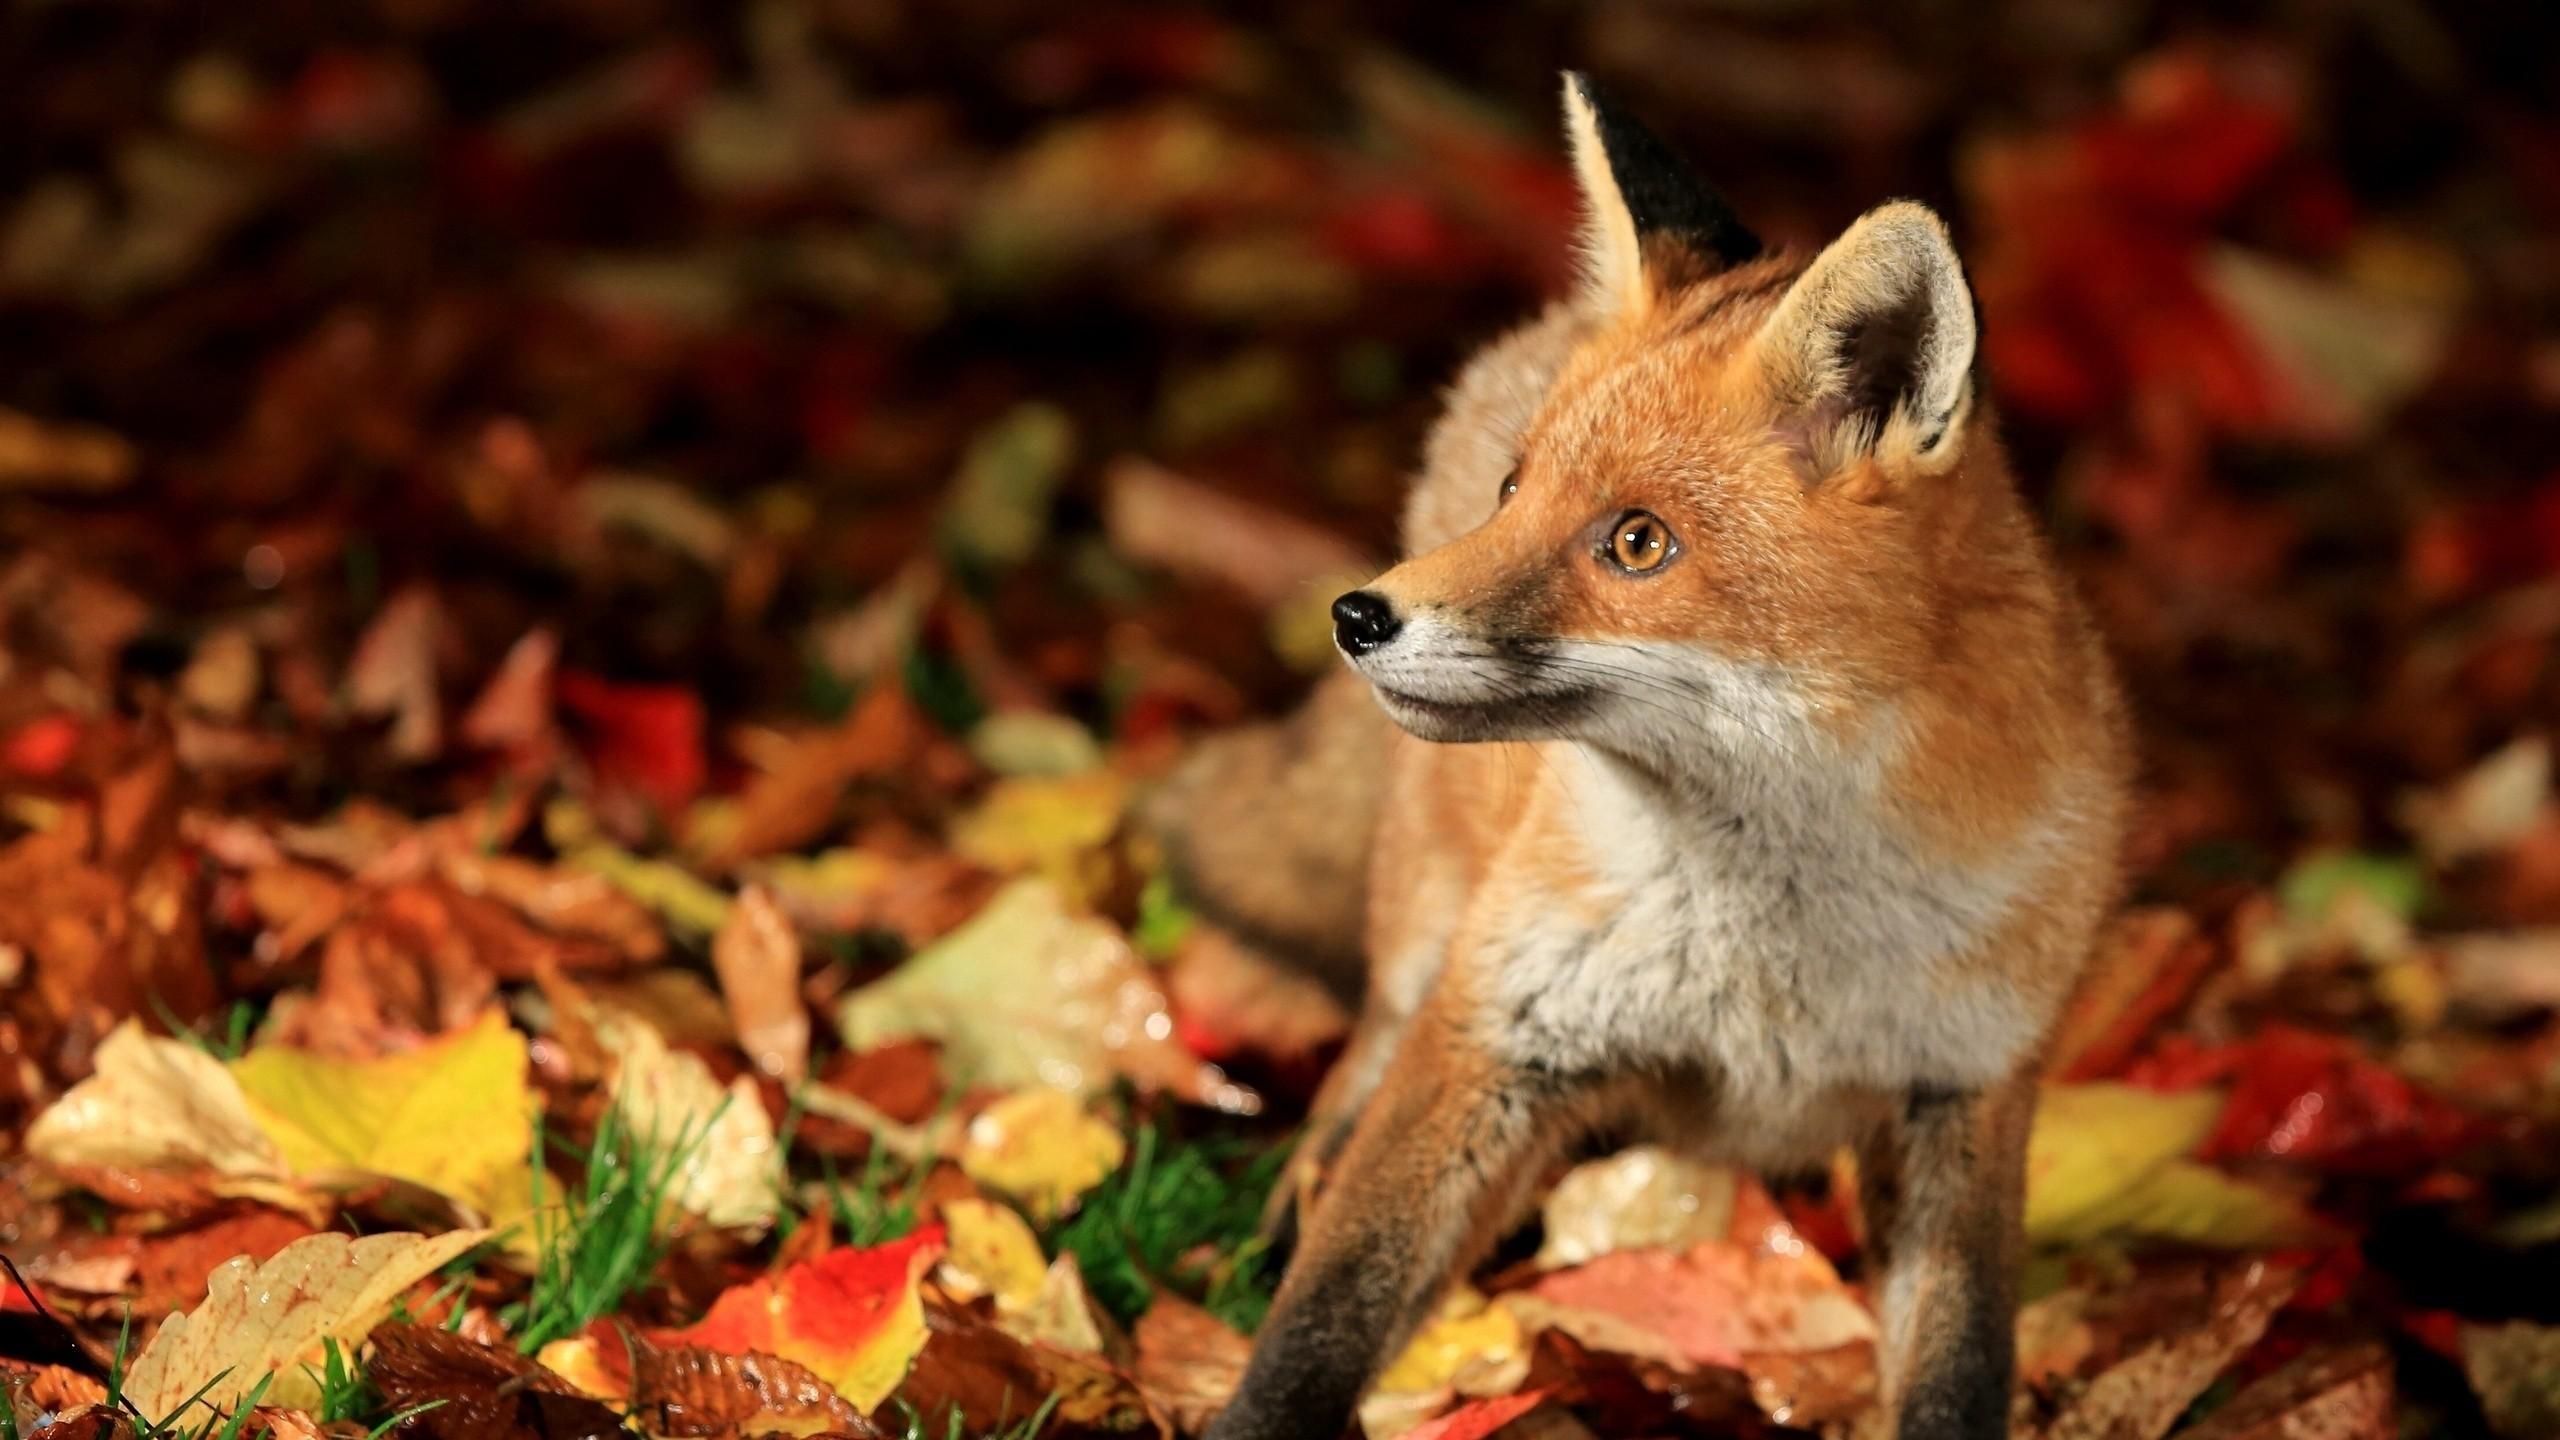 Res: 2560x1440,  Wallpaper fox, walk, leaves, fall, fear